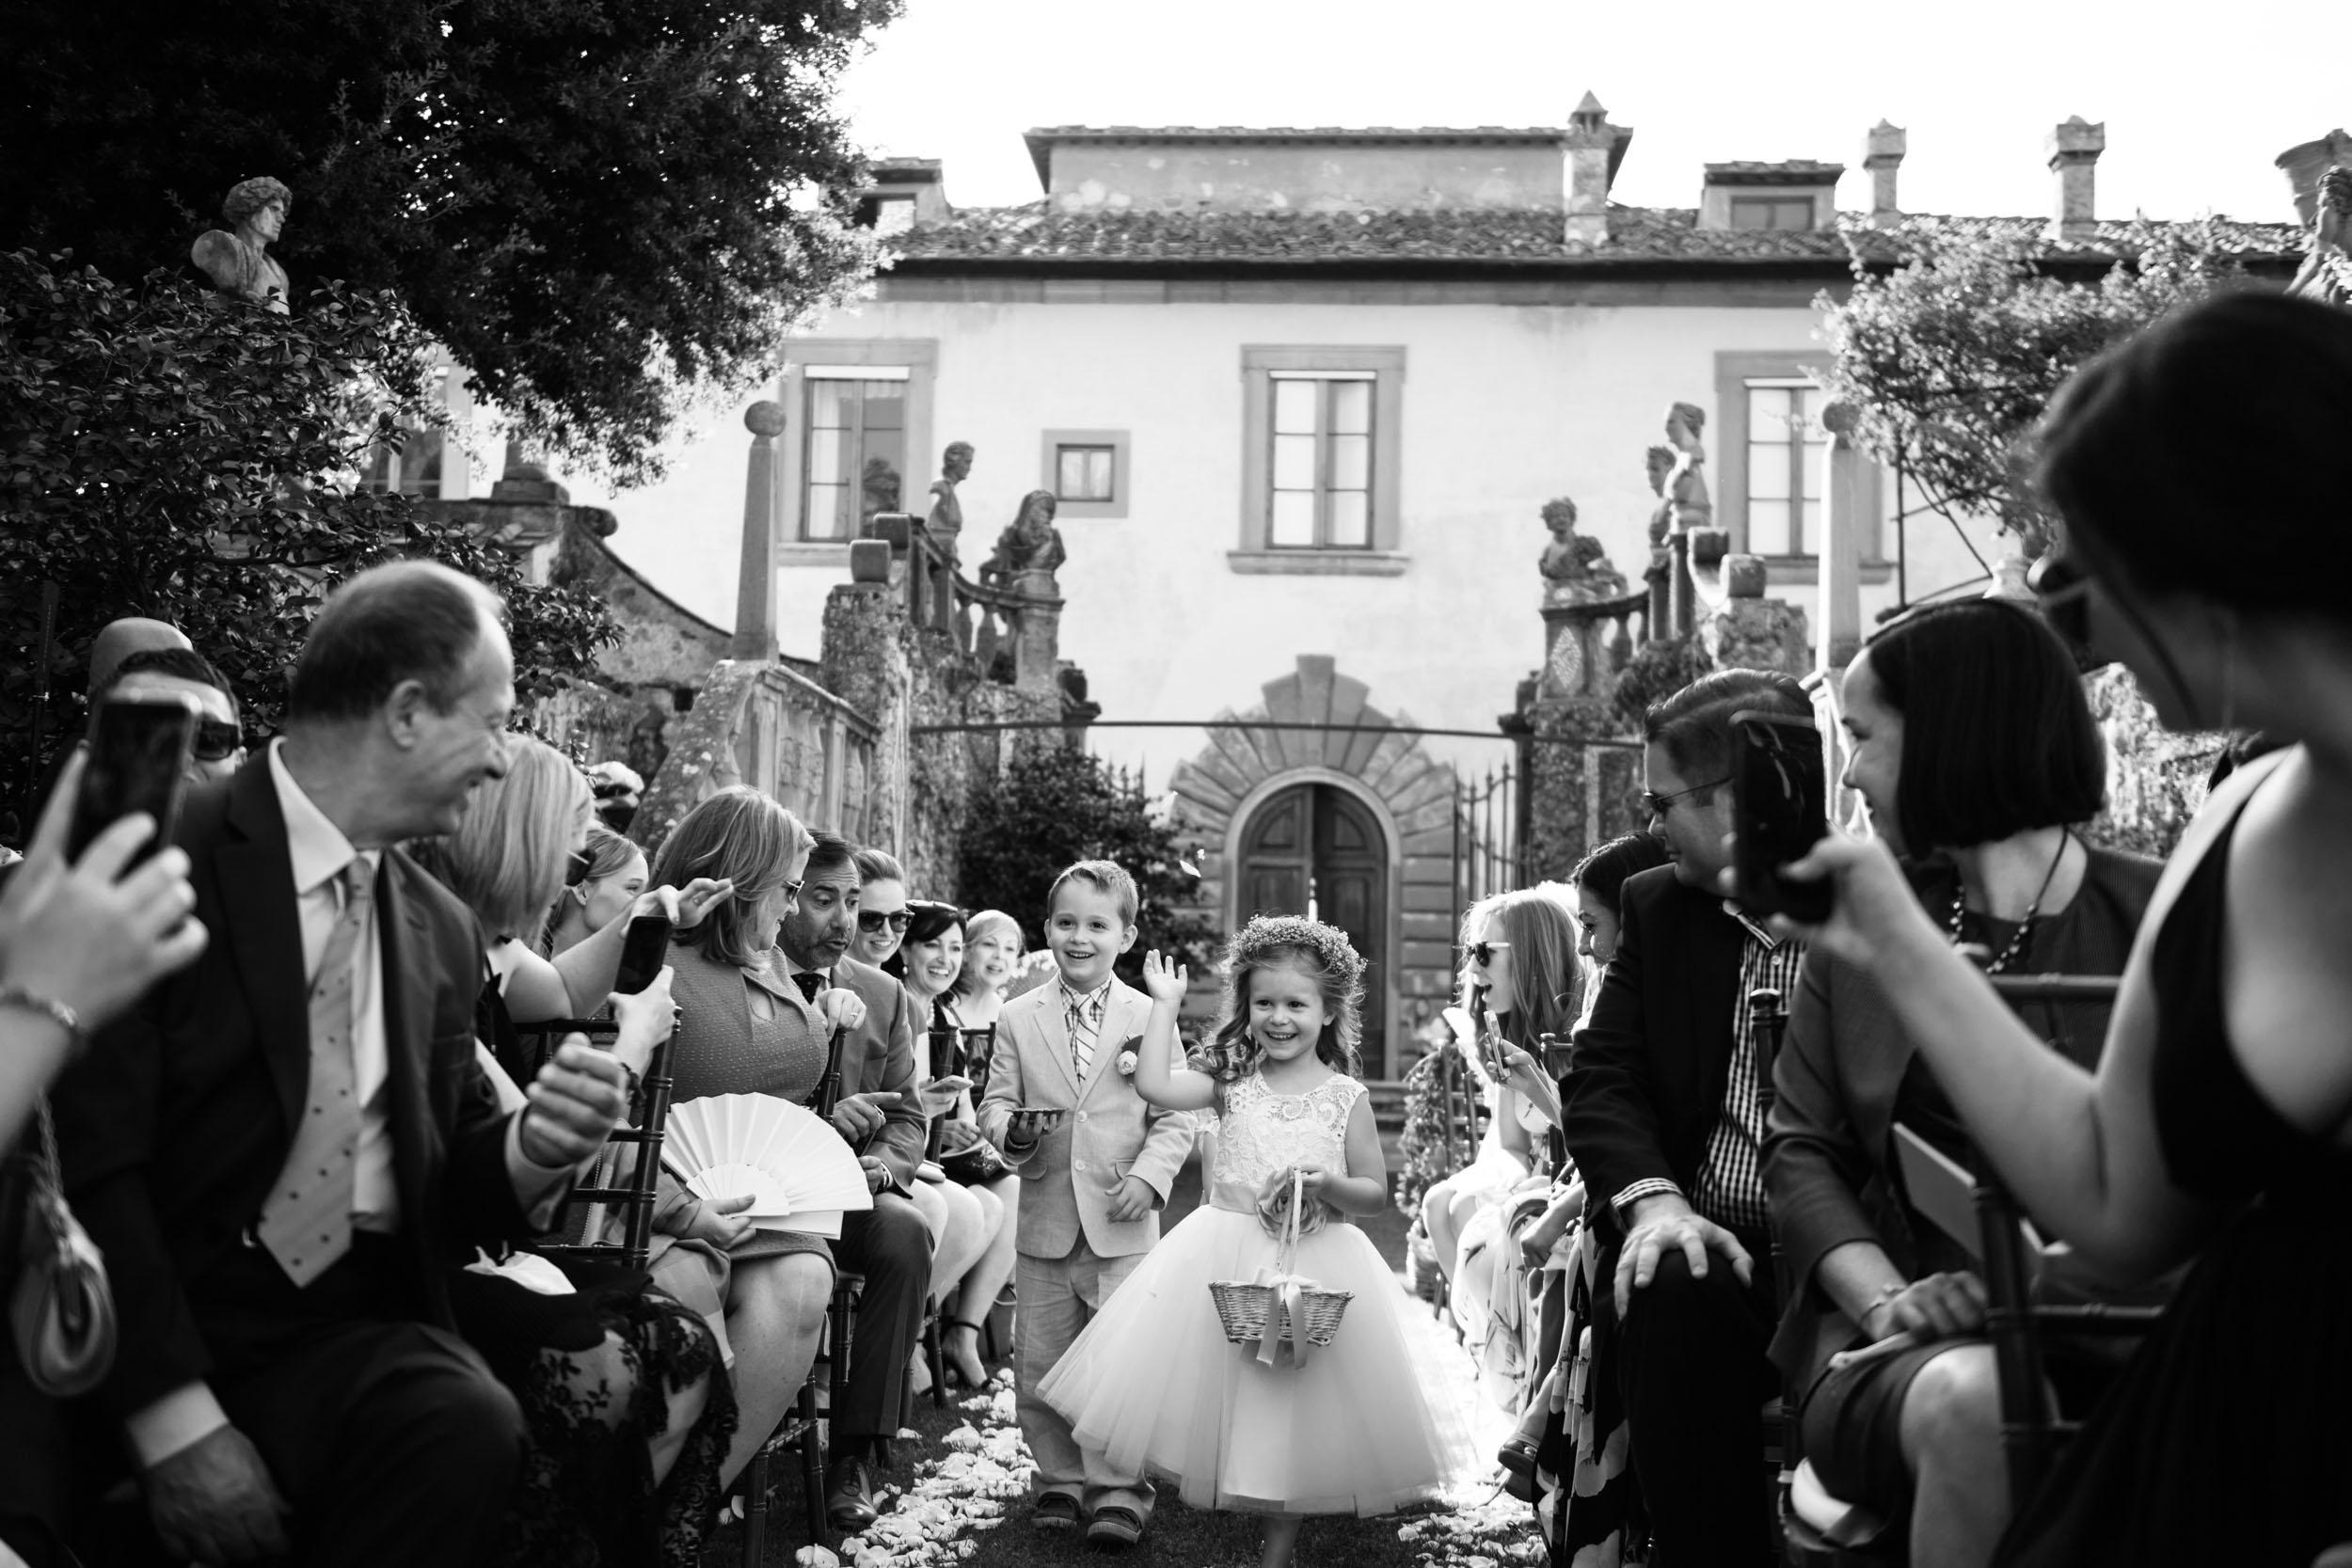 villa-gamberaia-florence-italy-destination-wedding-42.jpg